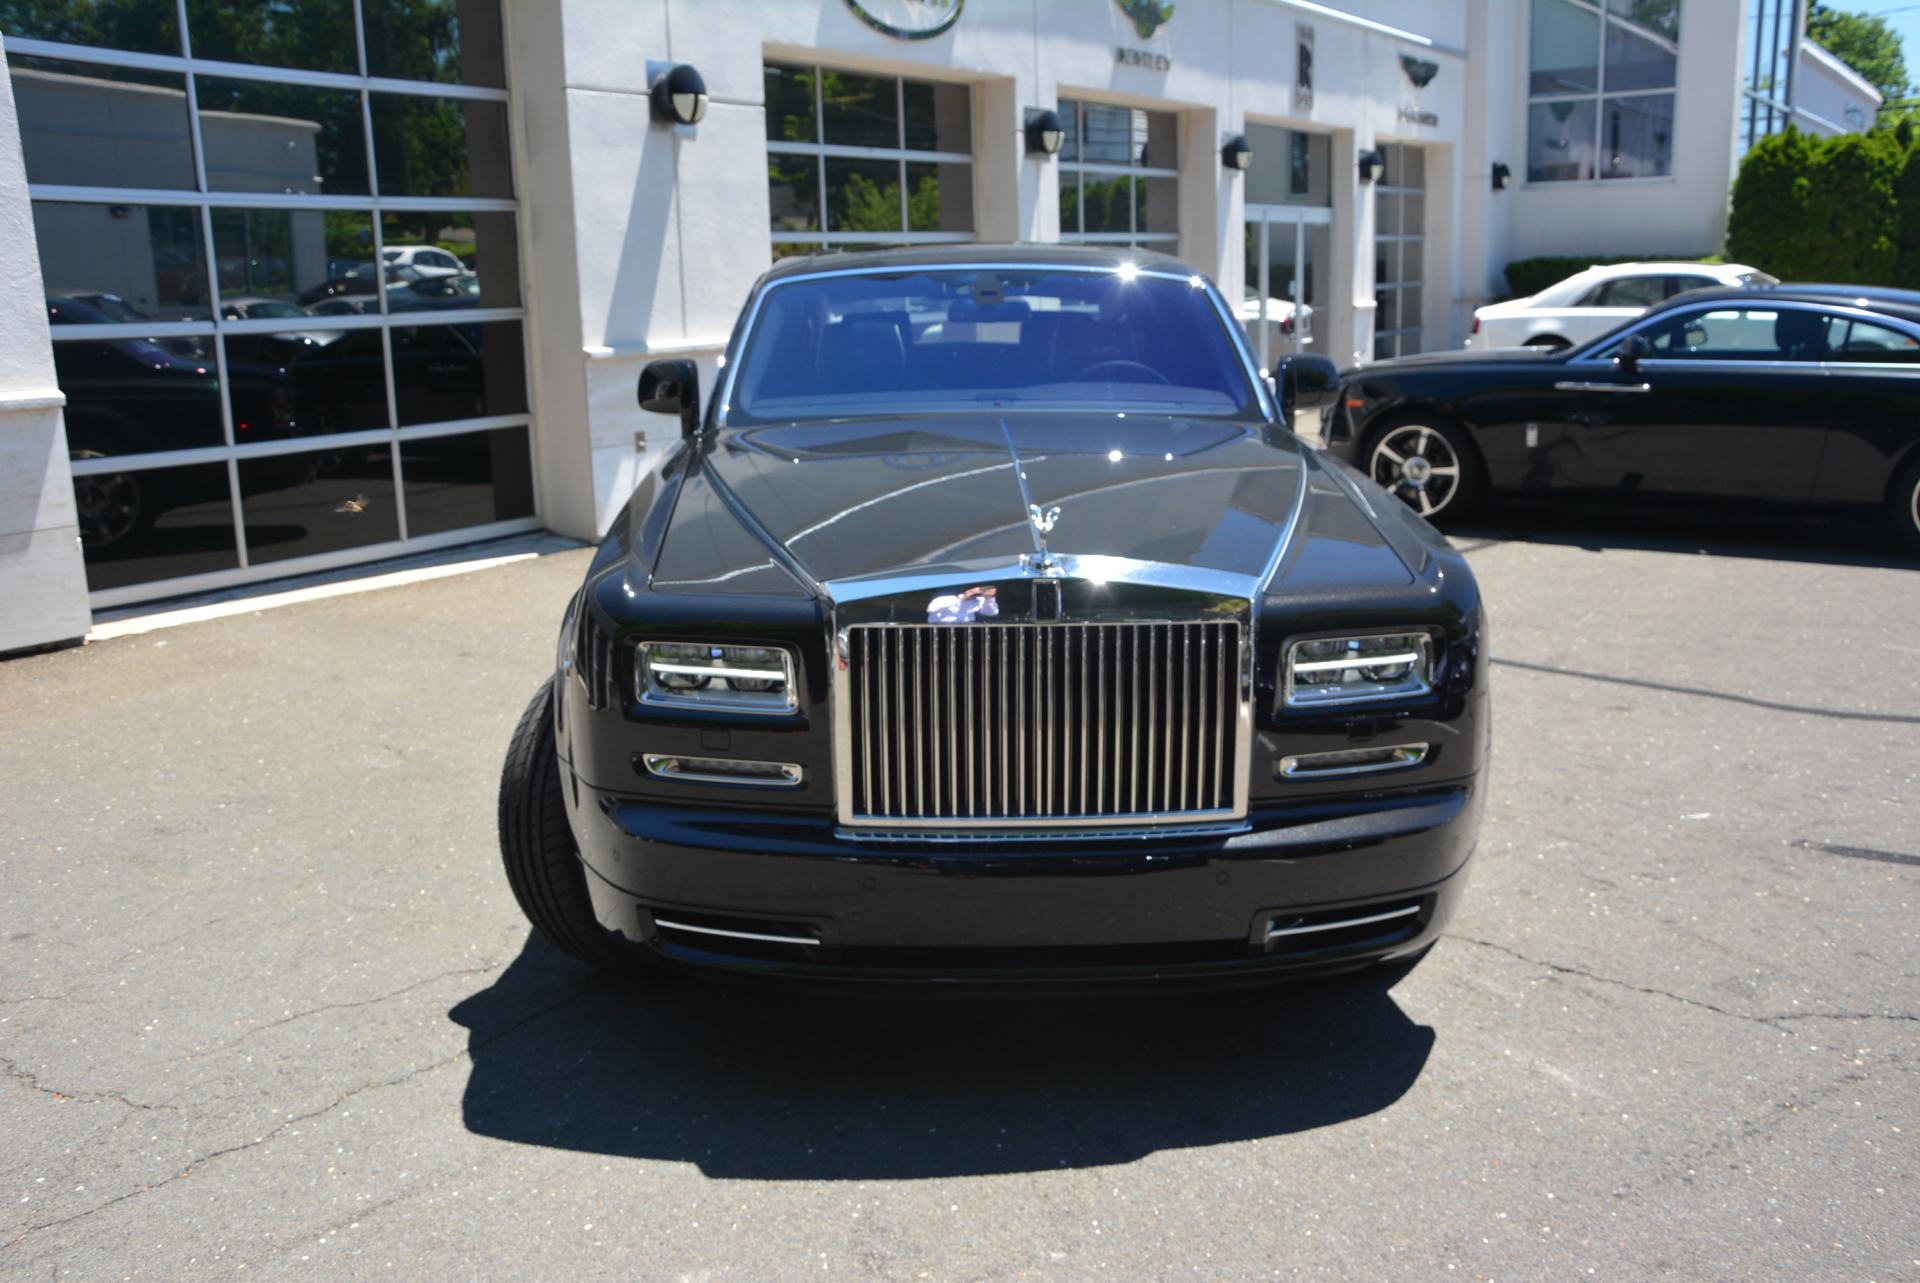 New 2016 Rolls-Royce Phantom  For Sale In Greenwich, CT 222_p2